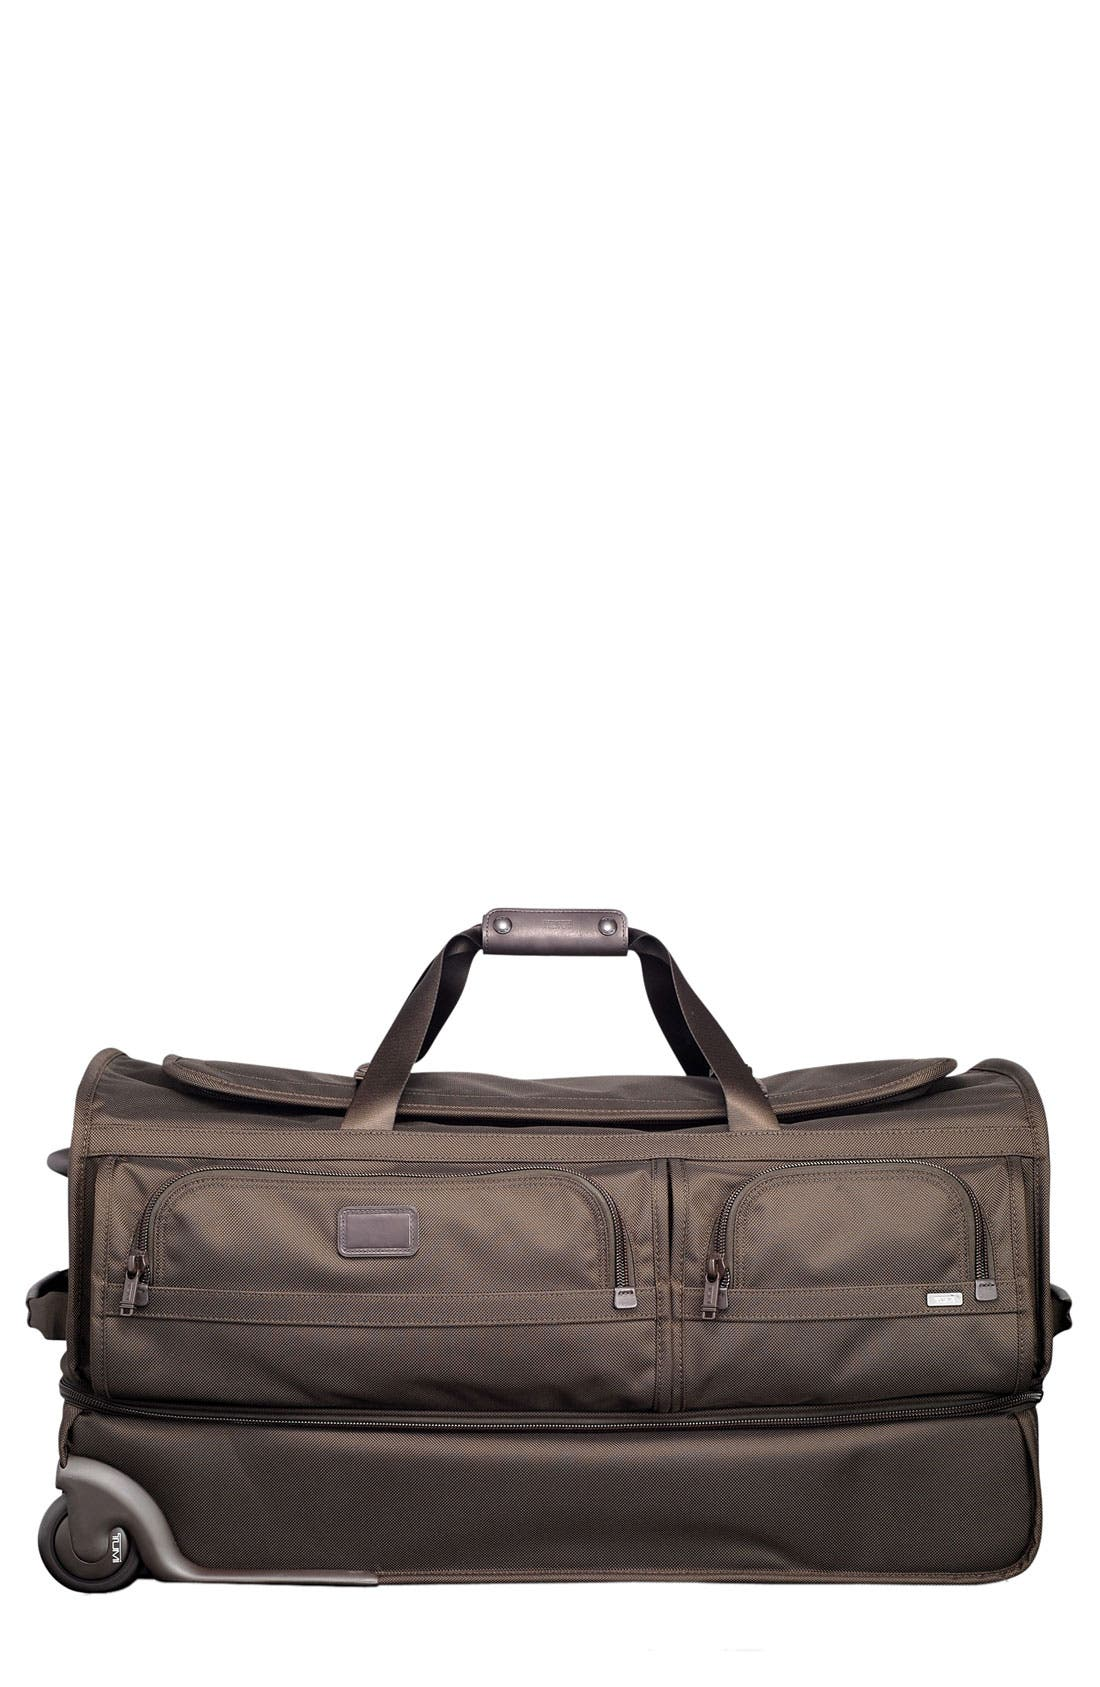 Alternate Image 1 Selected - Tumi 'Alpha - Large' Wheeled Split Duffel Bag